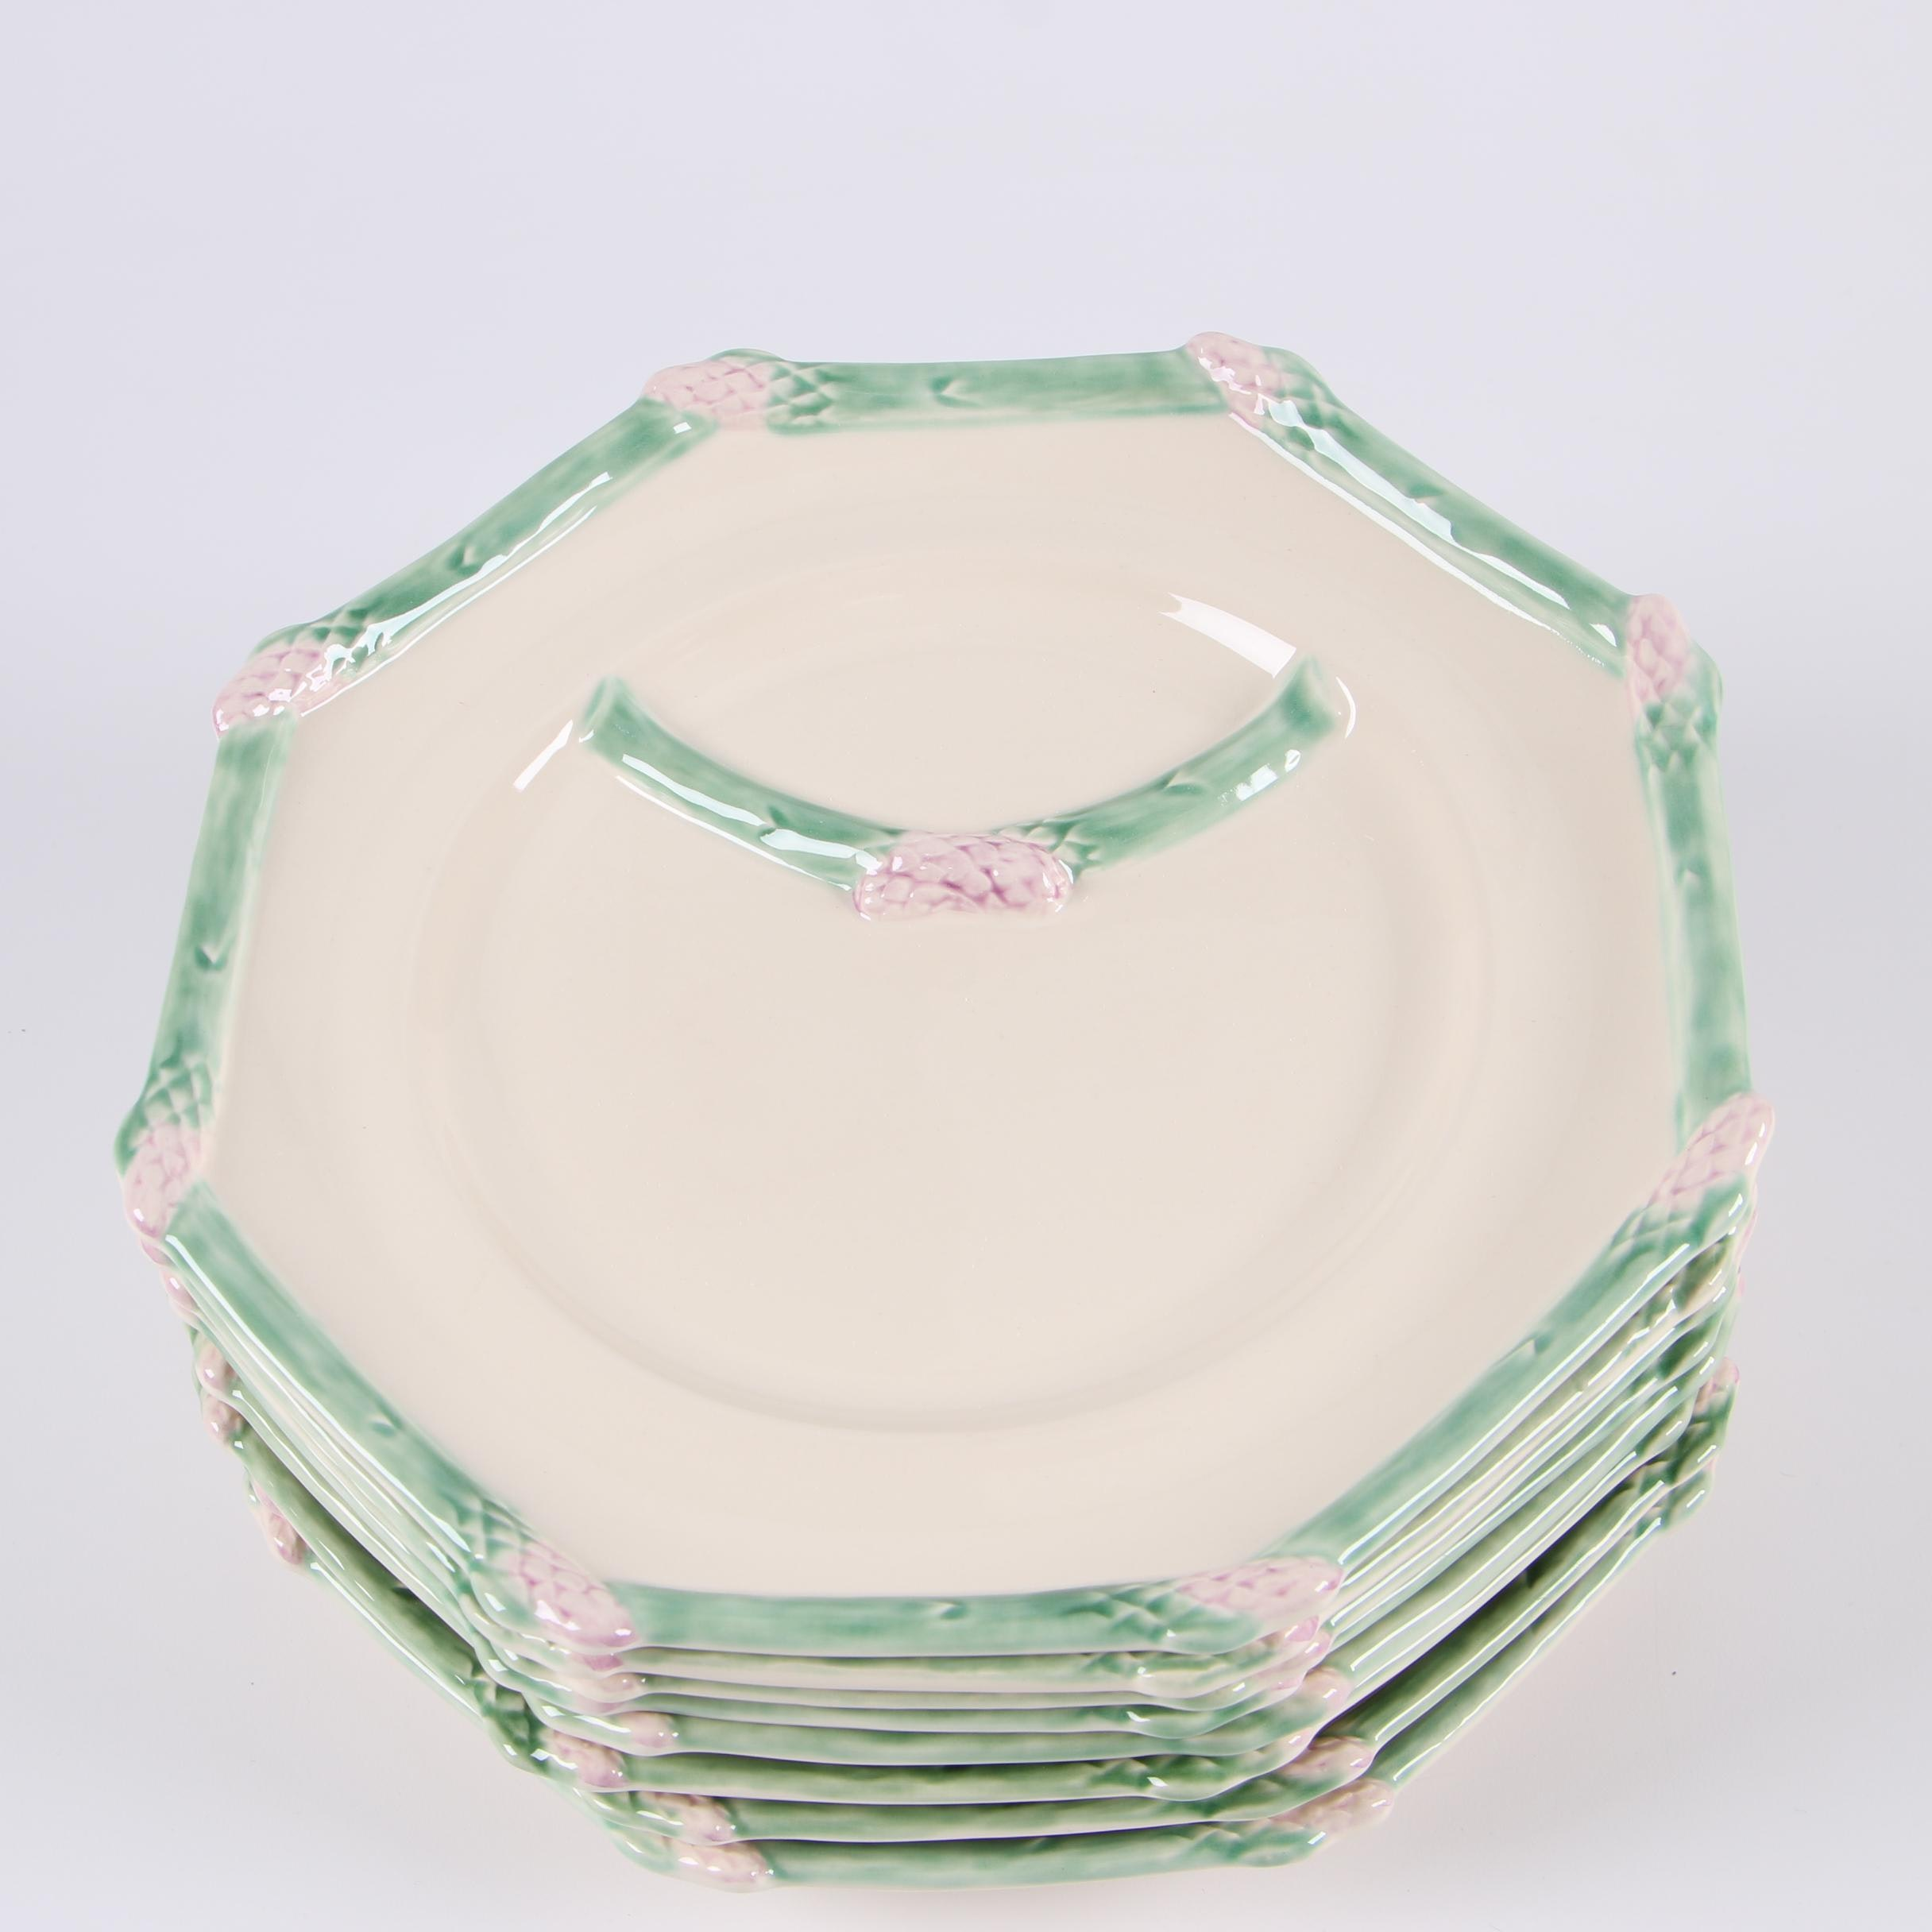 Bordallo Pinheiro Asparagus Themed Majolica Dinner Plates